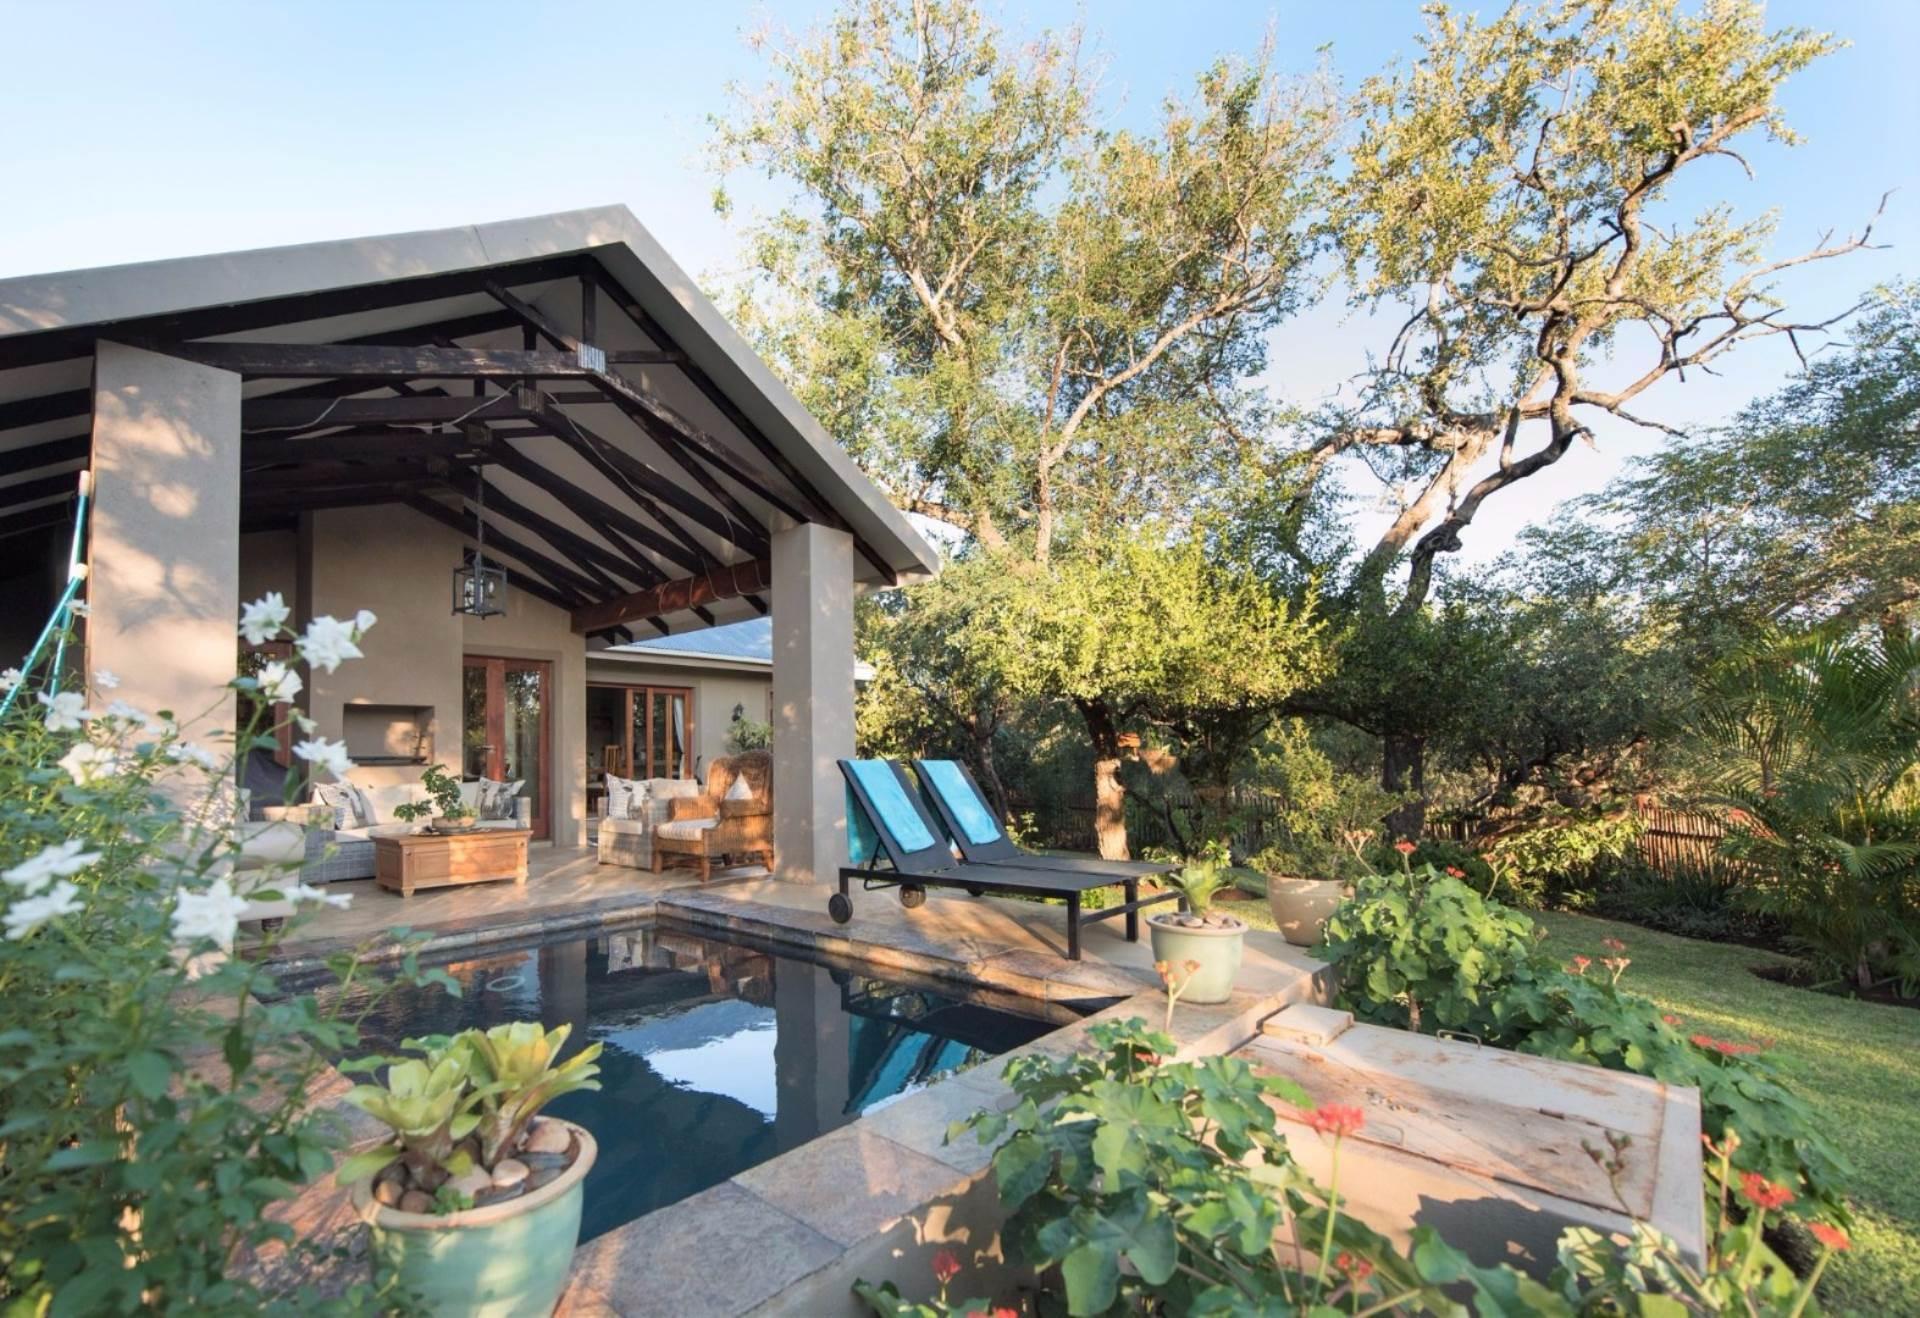 4 BedroomGuest House For Sale In Hoedspruit Wildlife Estate